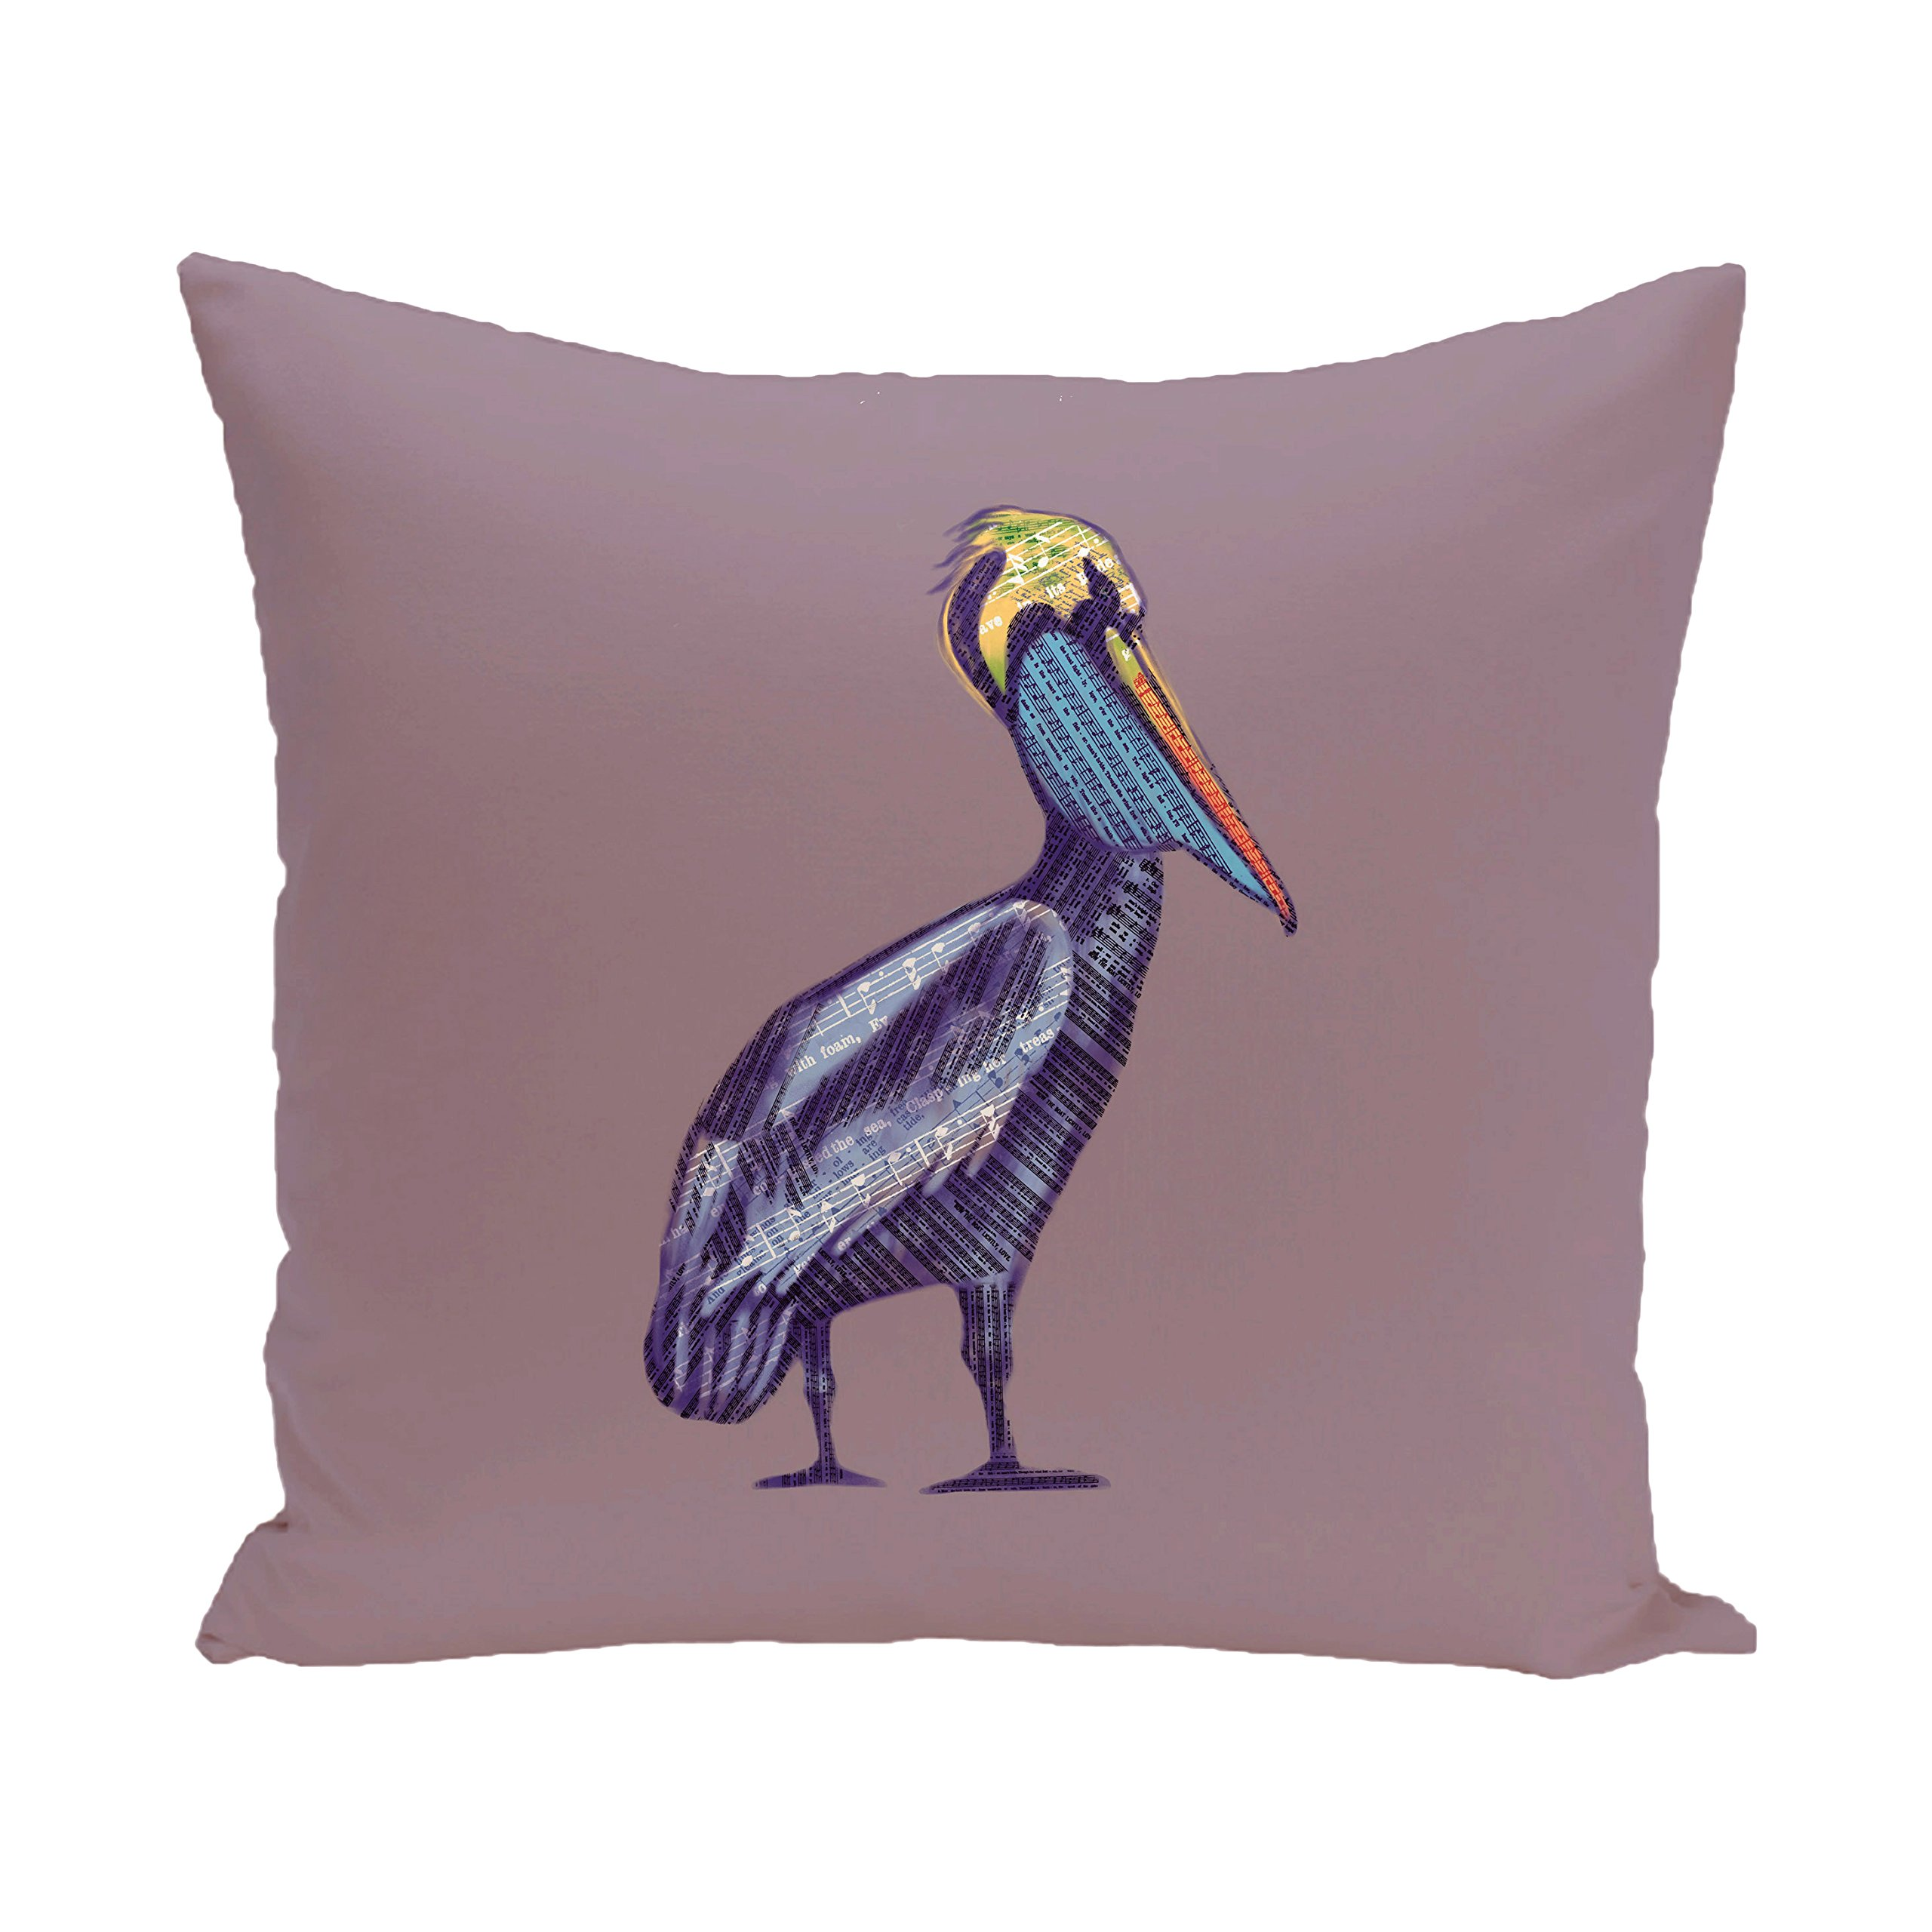 E by design O5PAN463PU14-20 20 x 20 Sea Music Animal Print Purple Outdoor Pillow